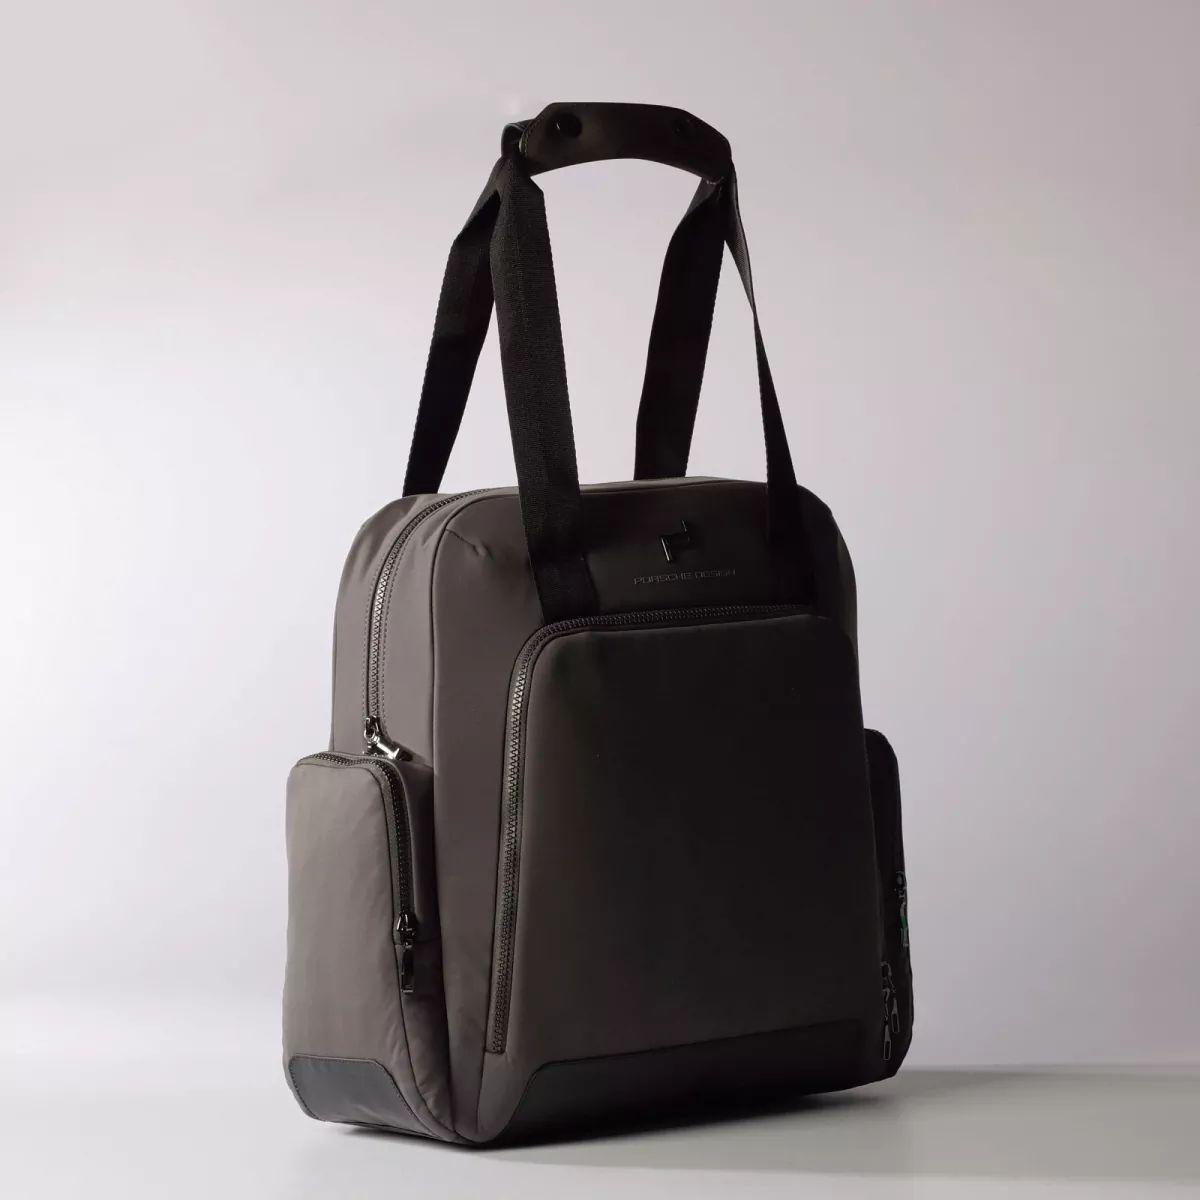 4951be2df083 NEW Porsche Design Sport by Adidas Gym Tote Bag Premium women s nwt